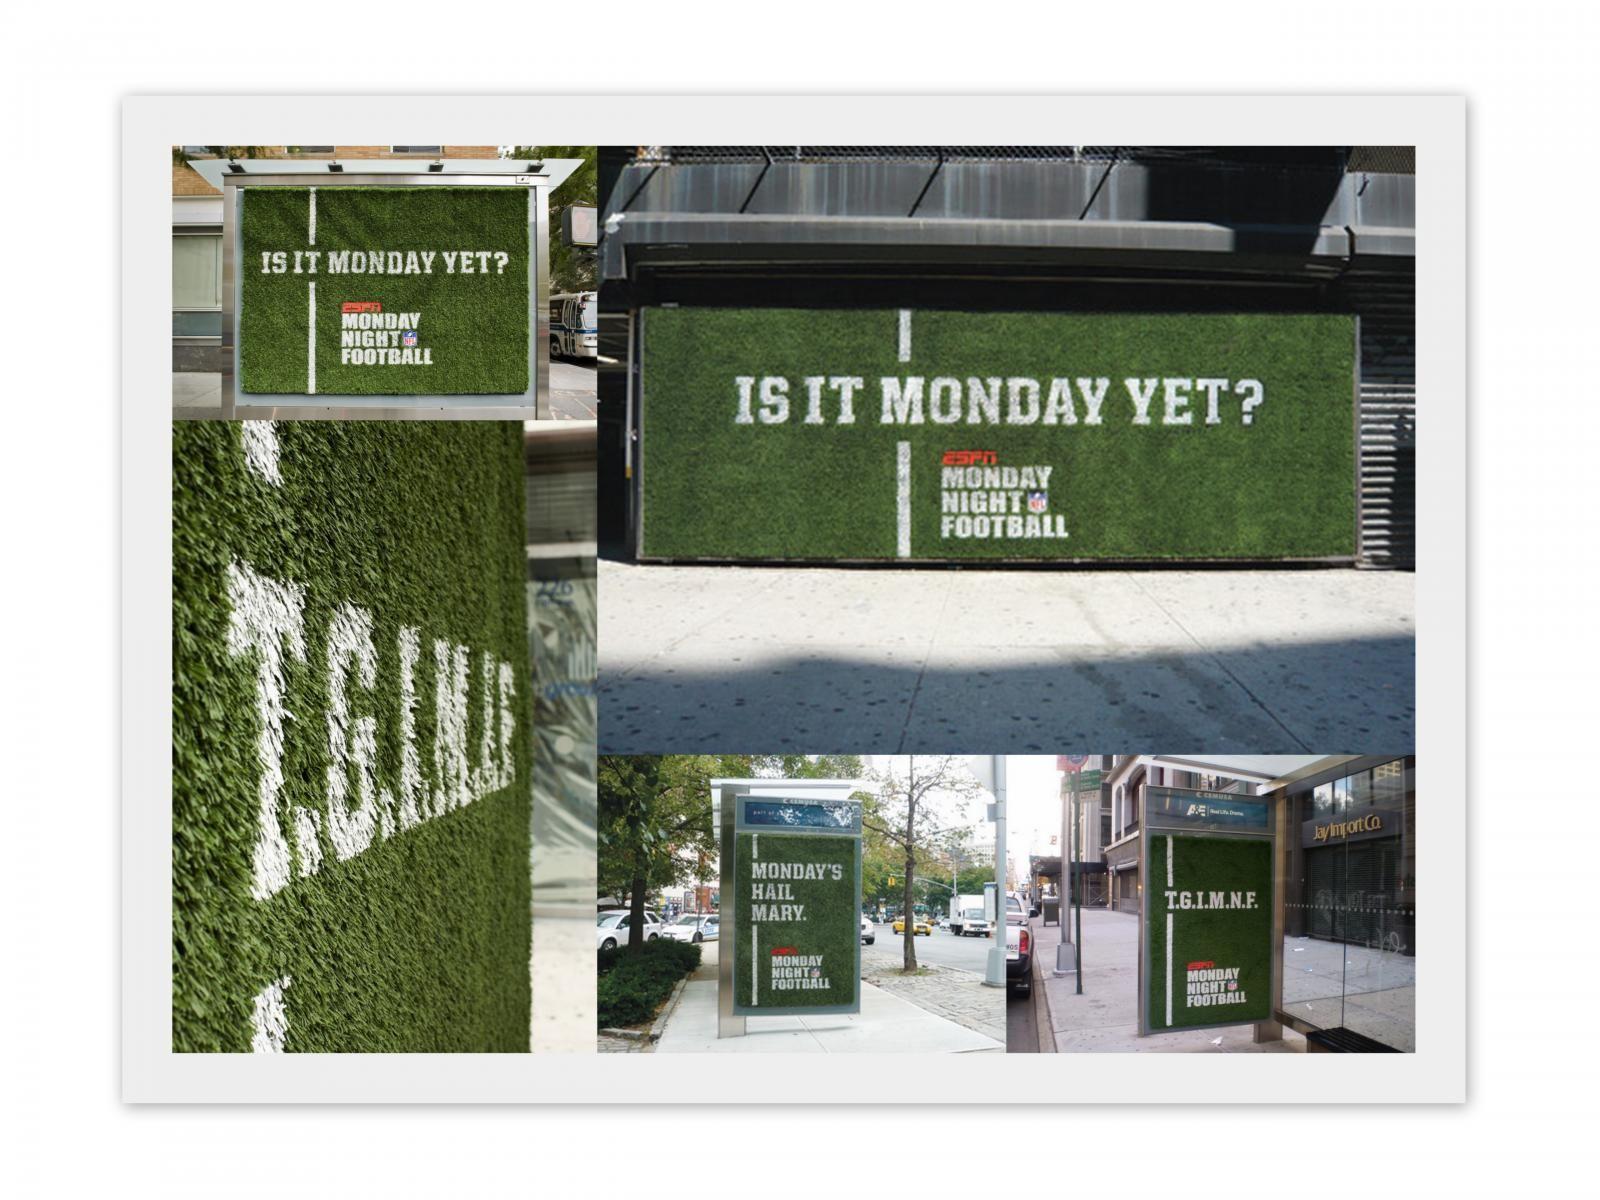 Espn On Abc Monday Night Football Turf Print Ad By Wieden